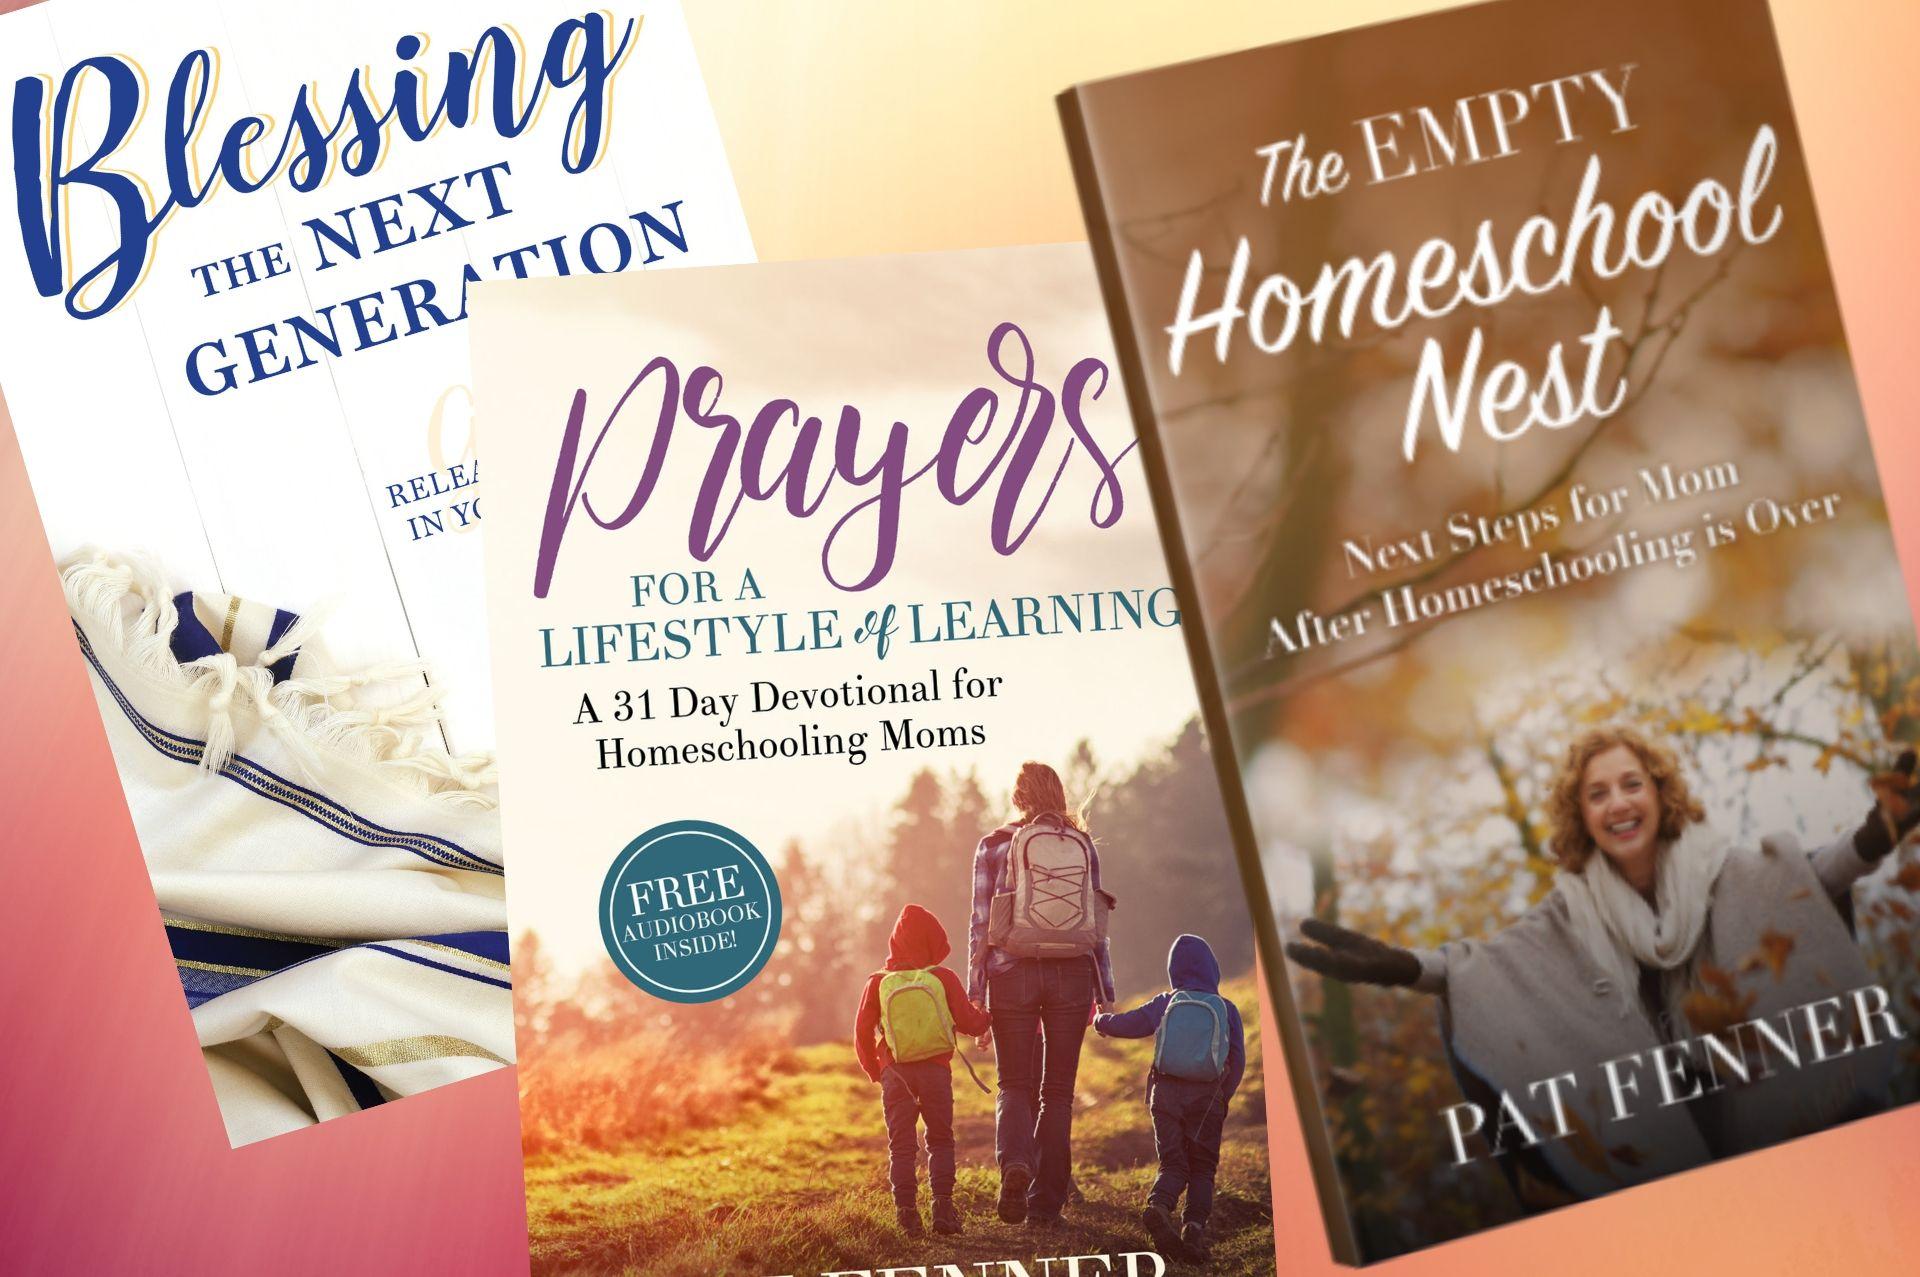 Read Pat Fenner's books